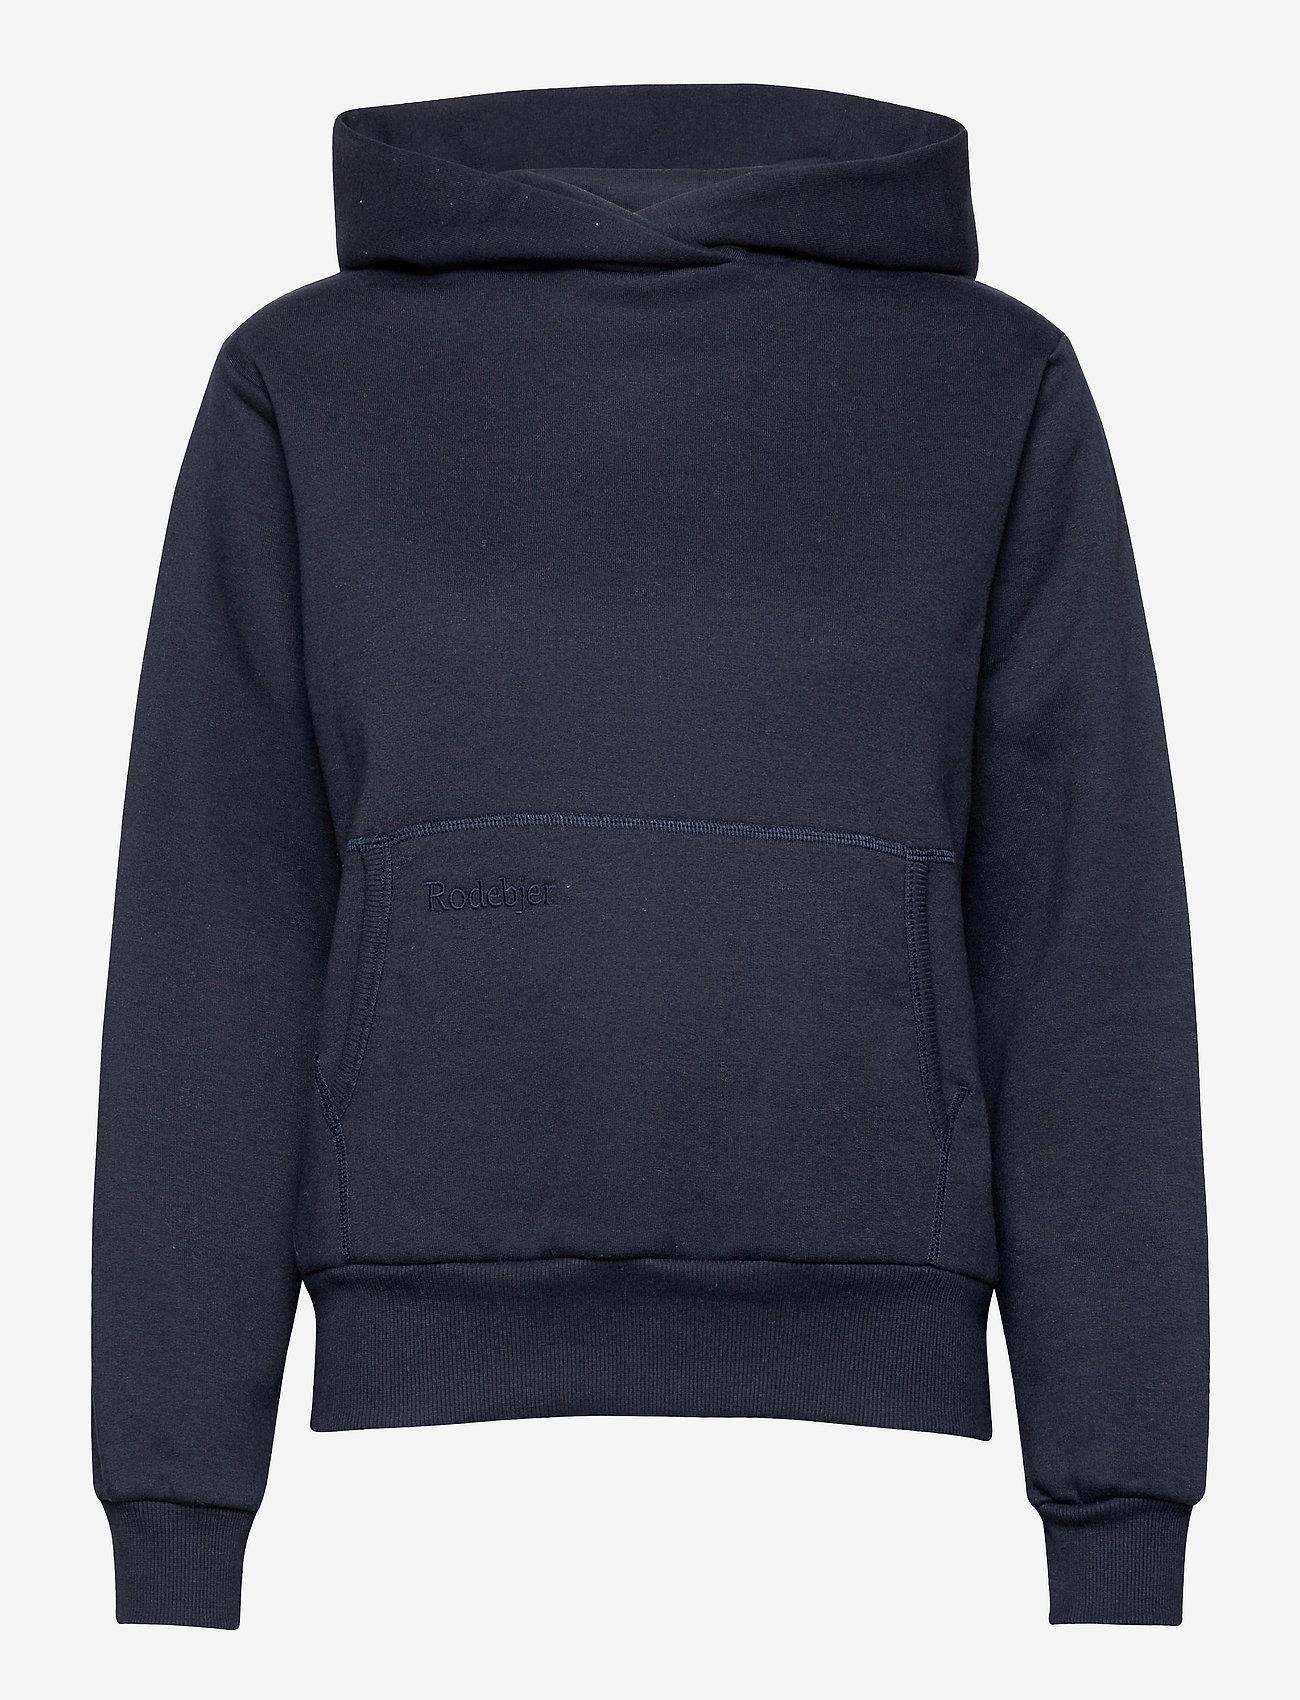 RODEBJER - RODEBJER MARQUESSA - sweatshirts & hættetrøjer - navy - 0